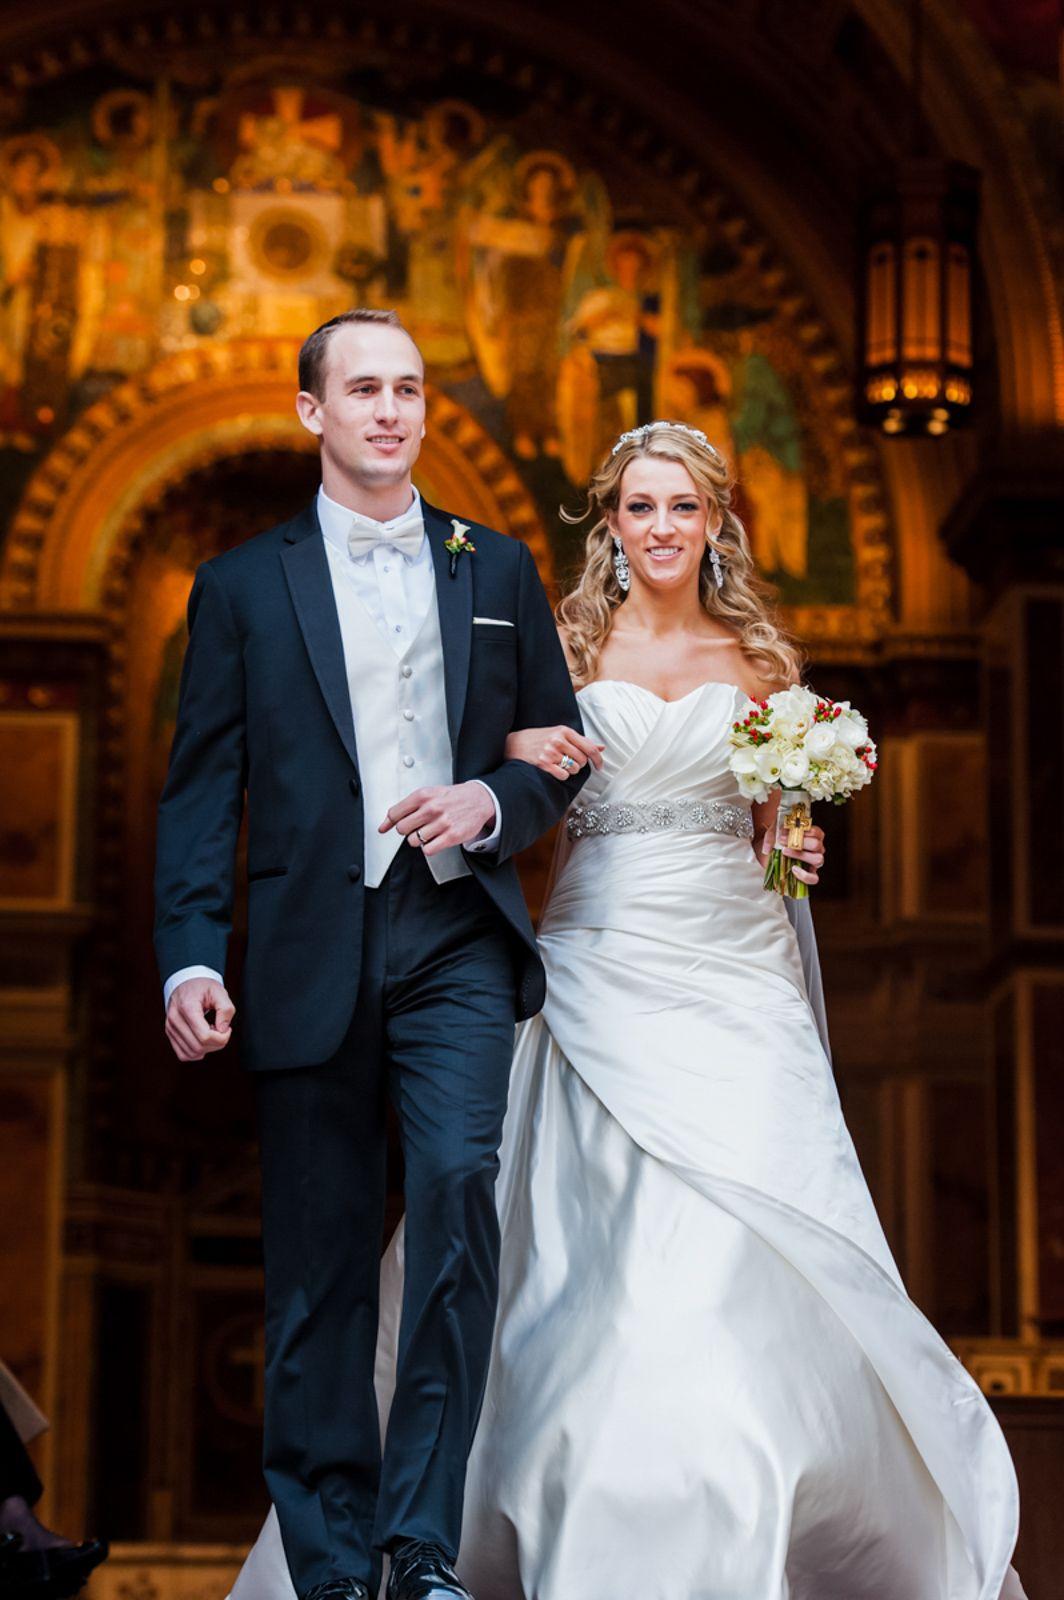 Wedding photographers dc yahoo image search results language